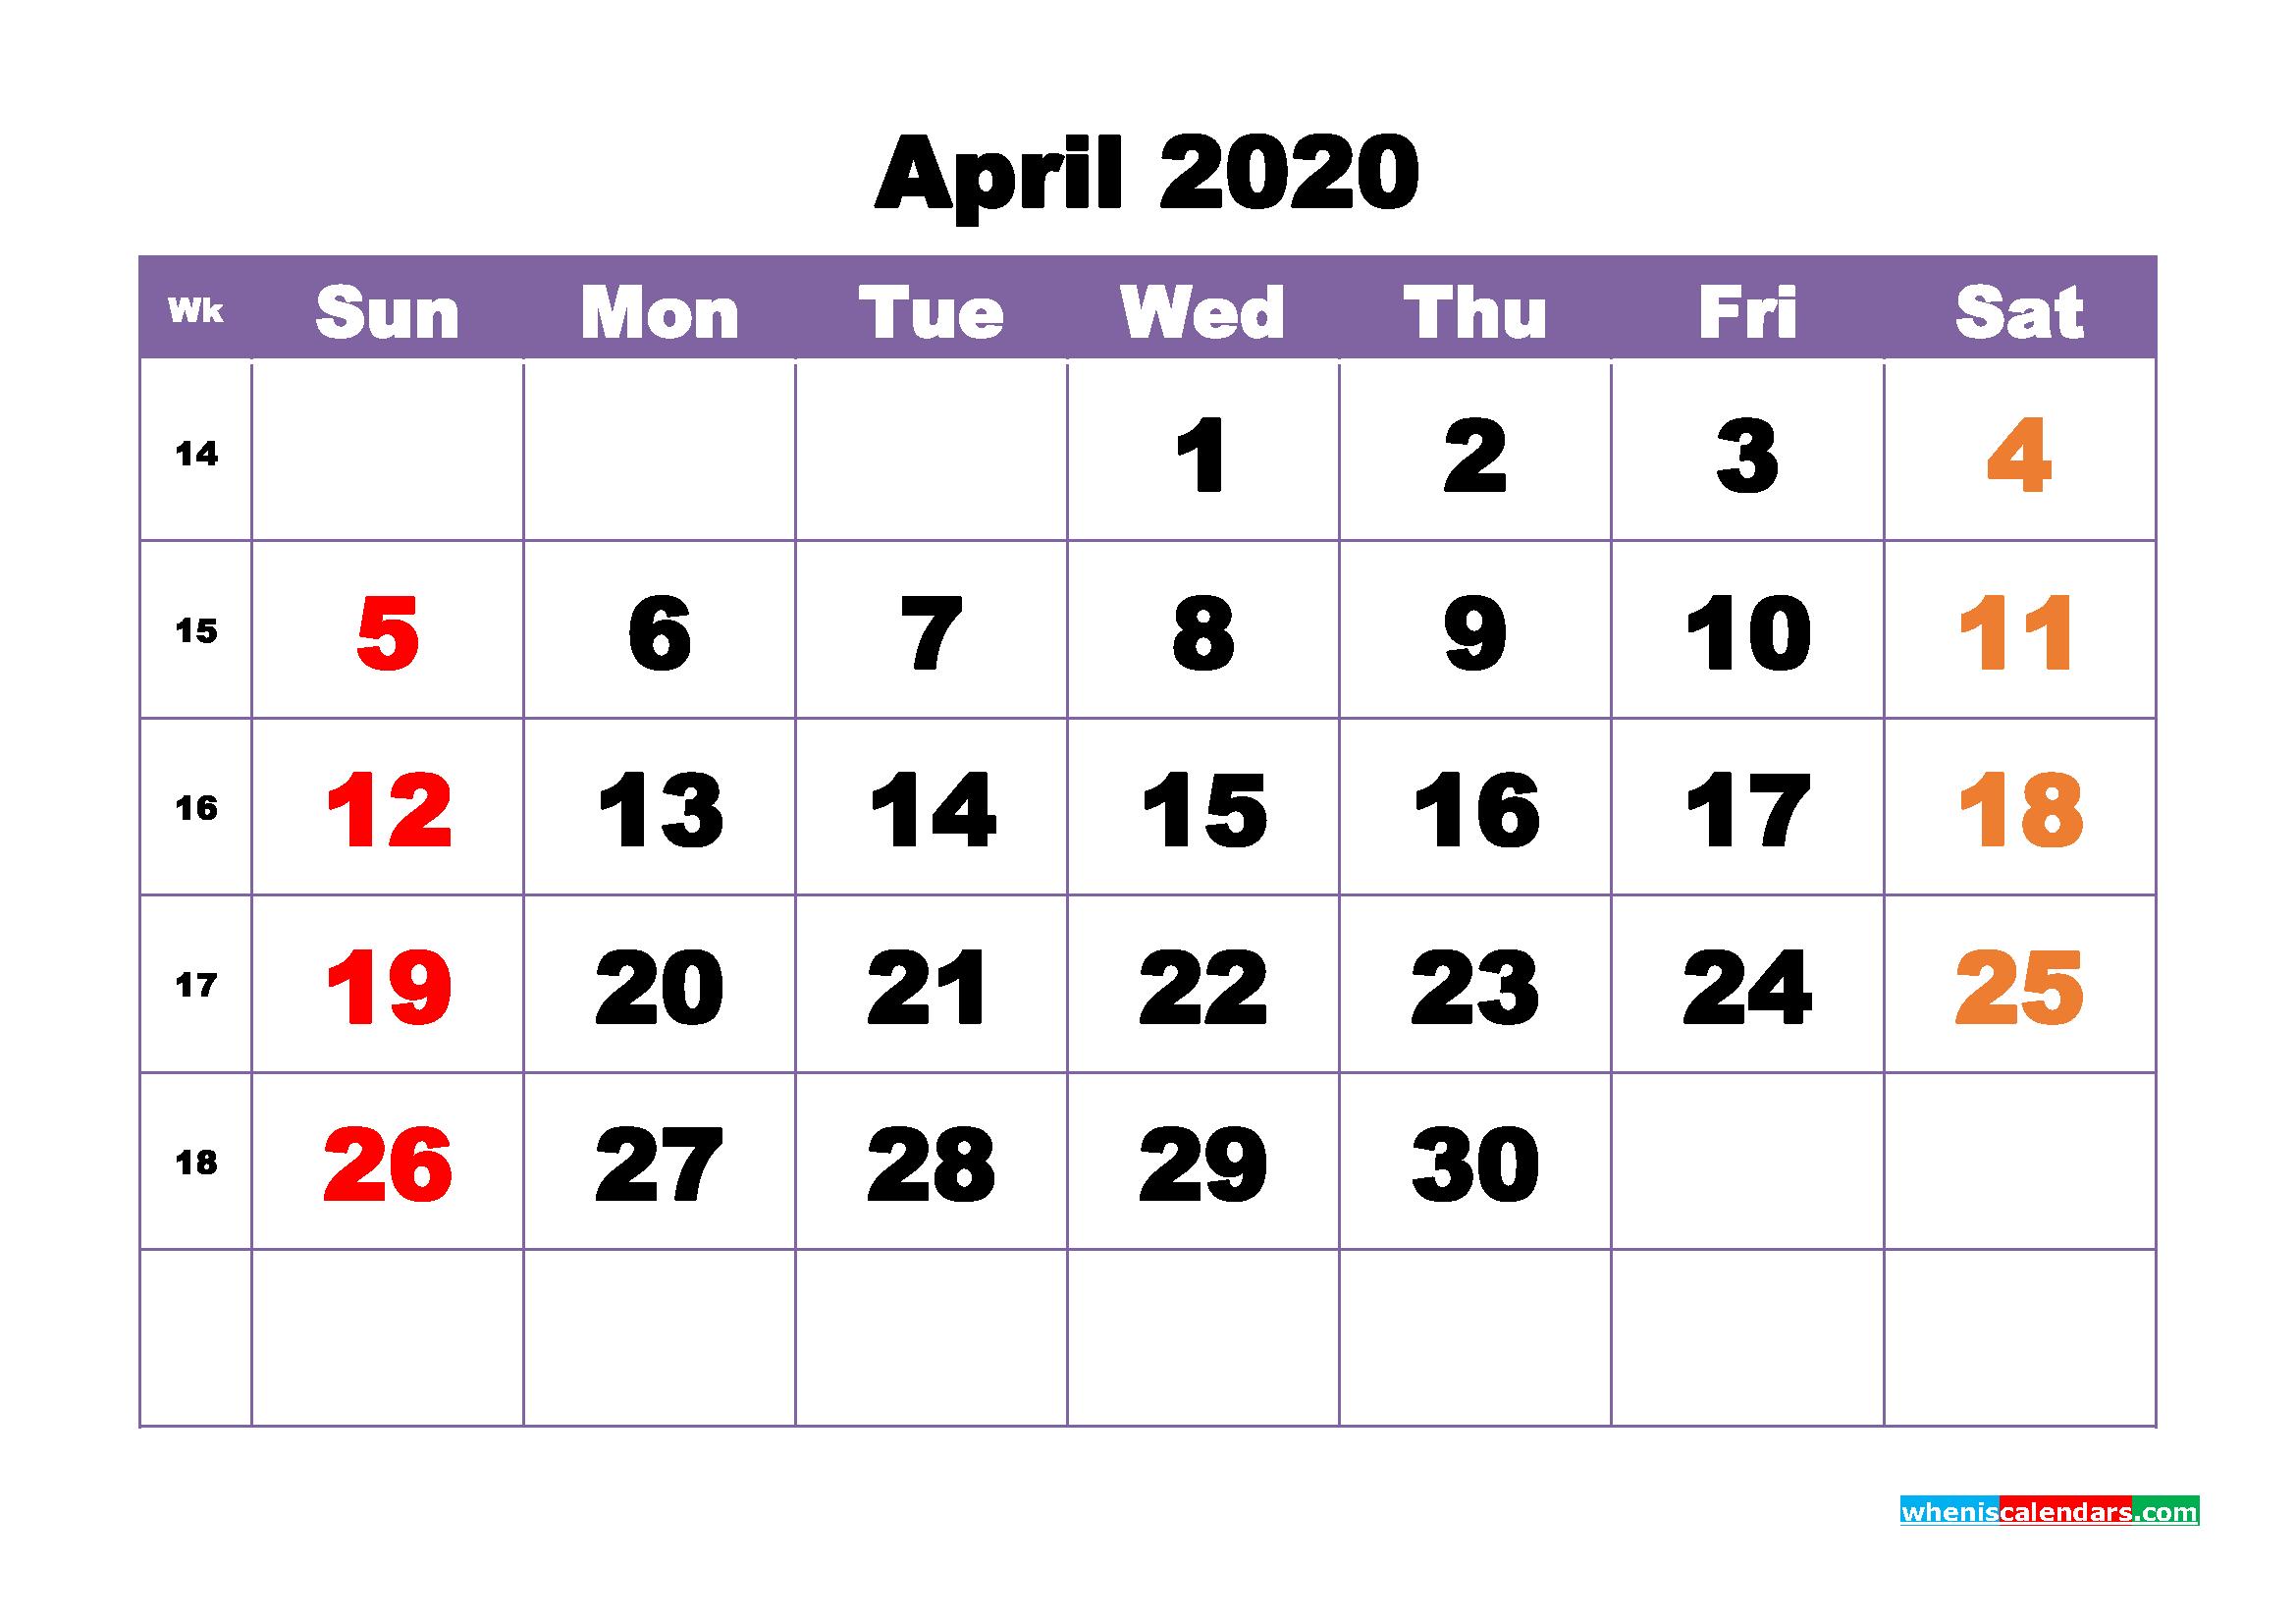 Free Printable April 2020 Calendar - No.m20b388